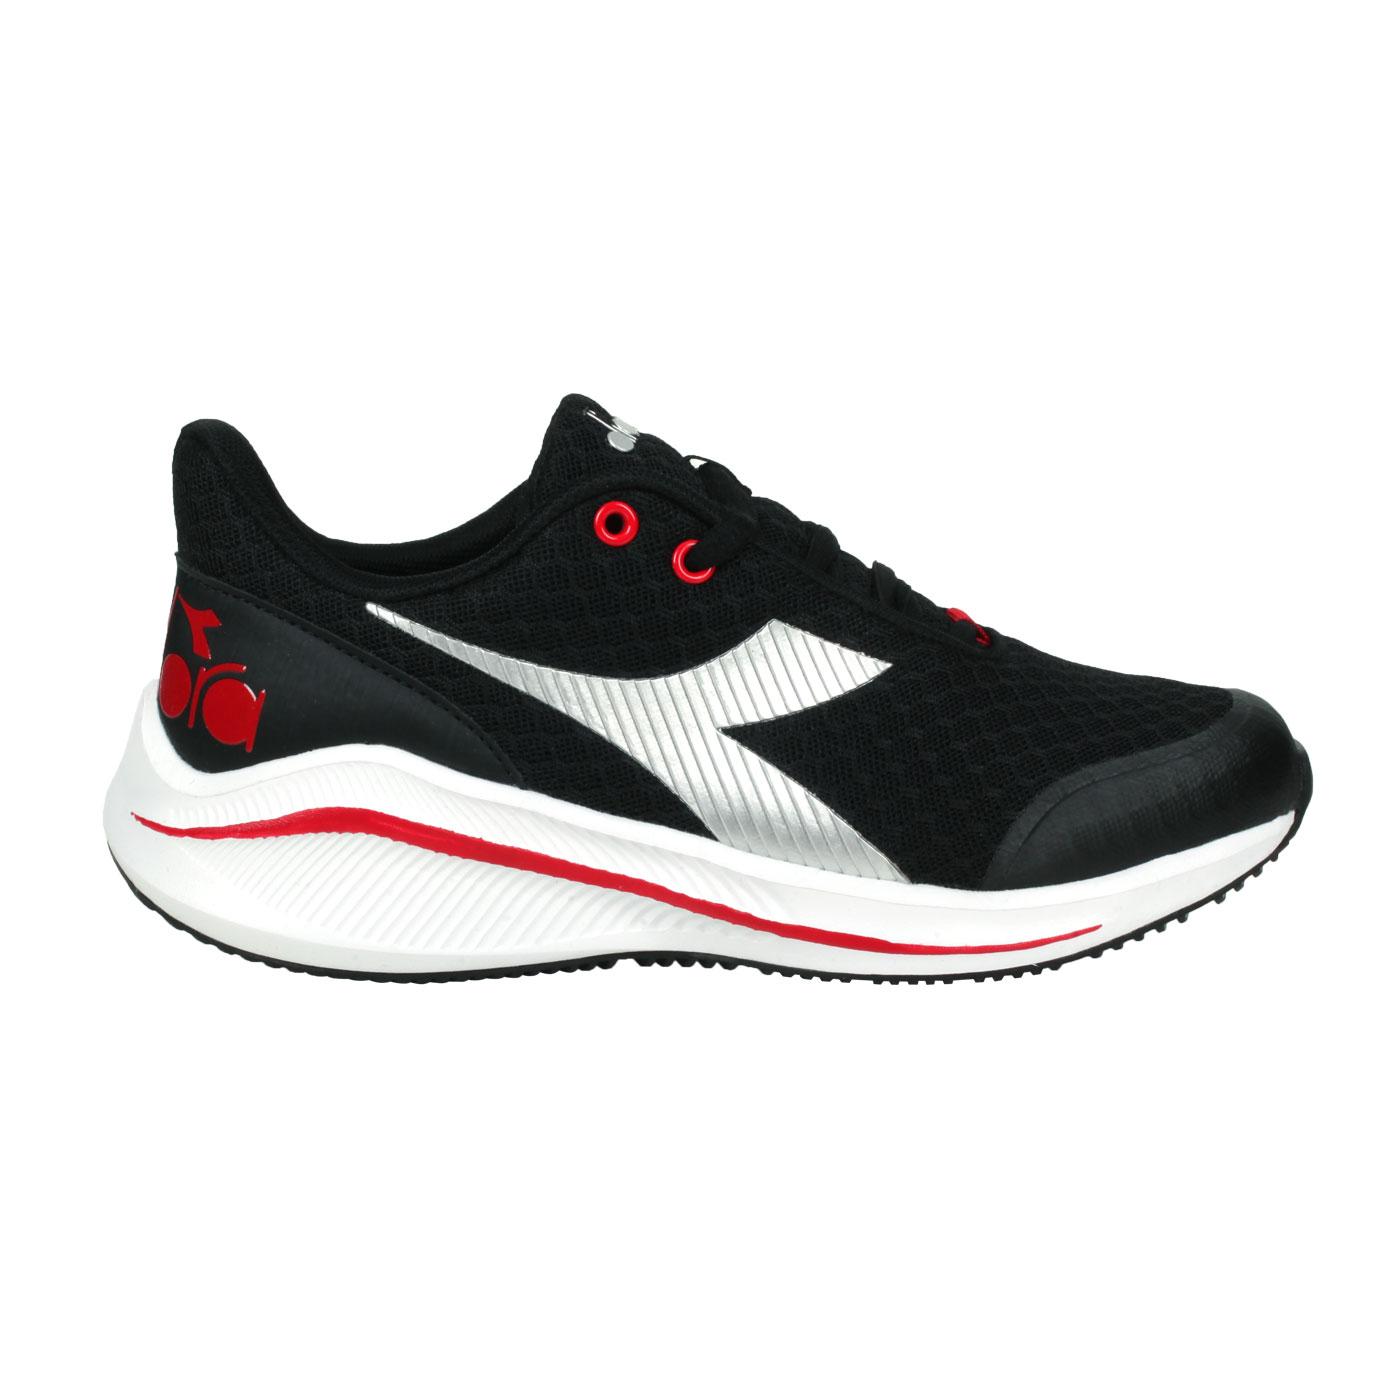 DIADORA 大童專業輕量慢跑鞋-超寬楦 DA11033 - 黑紅銀